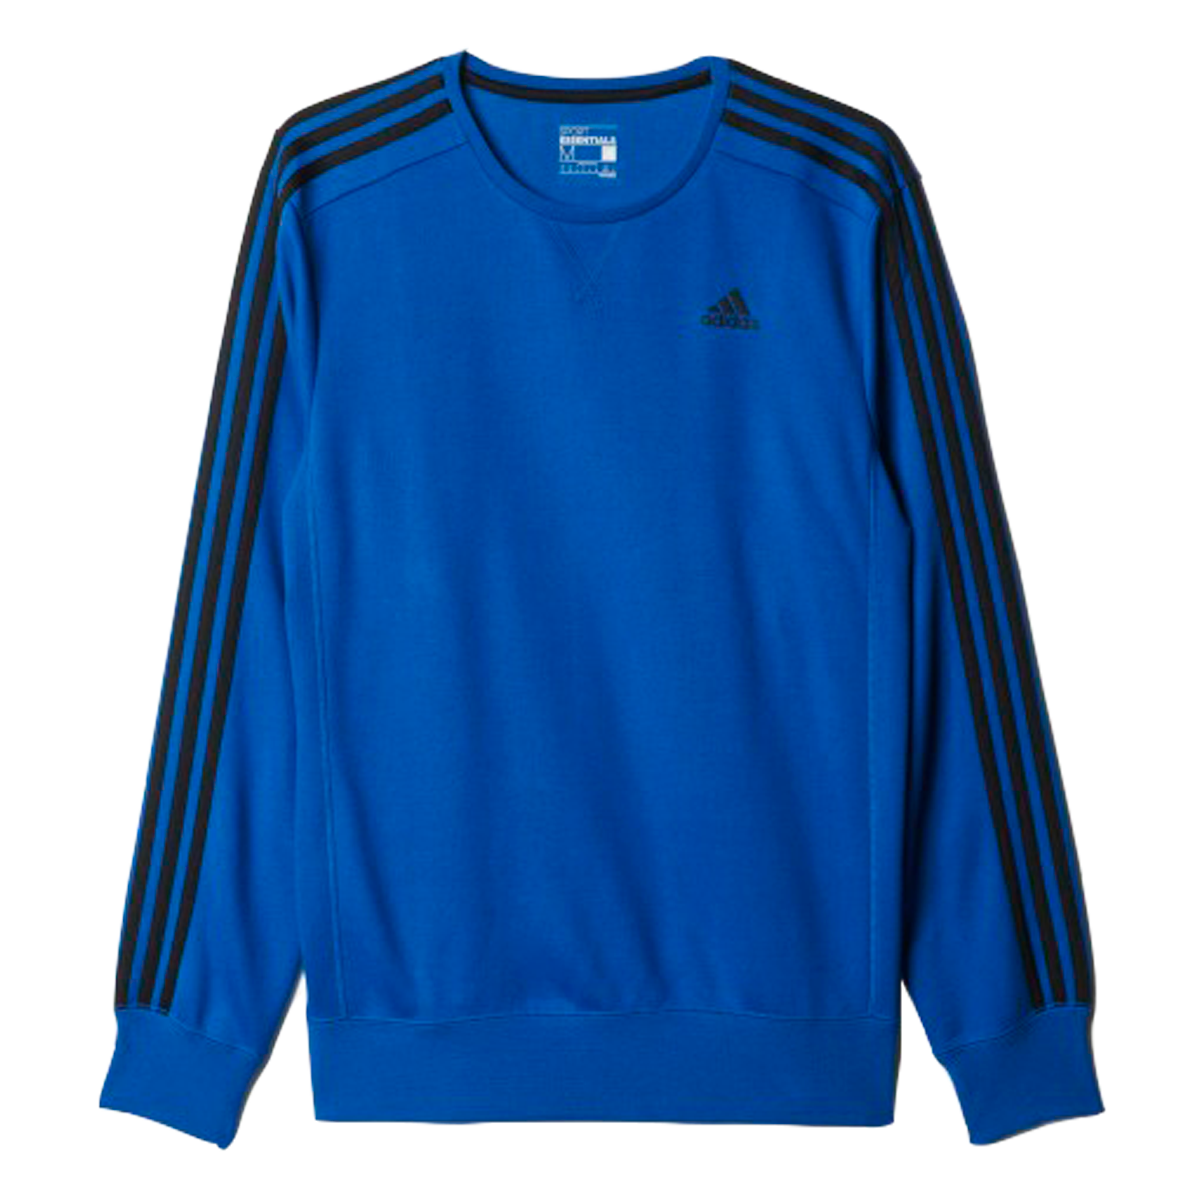 f1fa2714c7c Bizz Store - Moletom Masculino Adidas Ess 3s Crew FT Azul